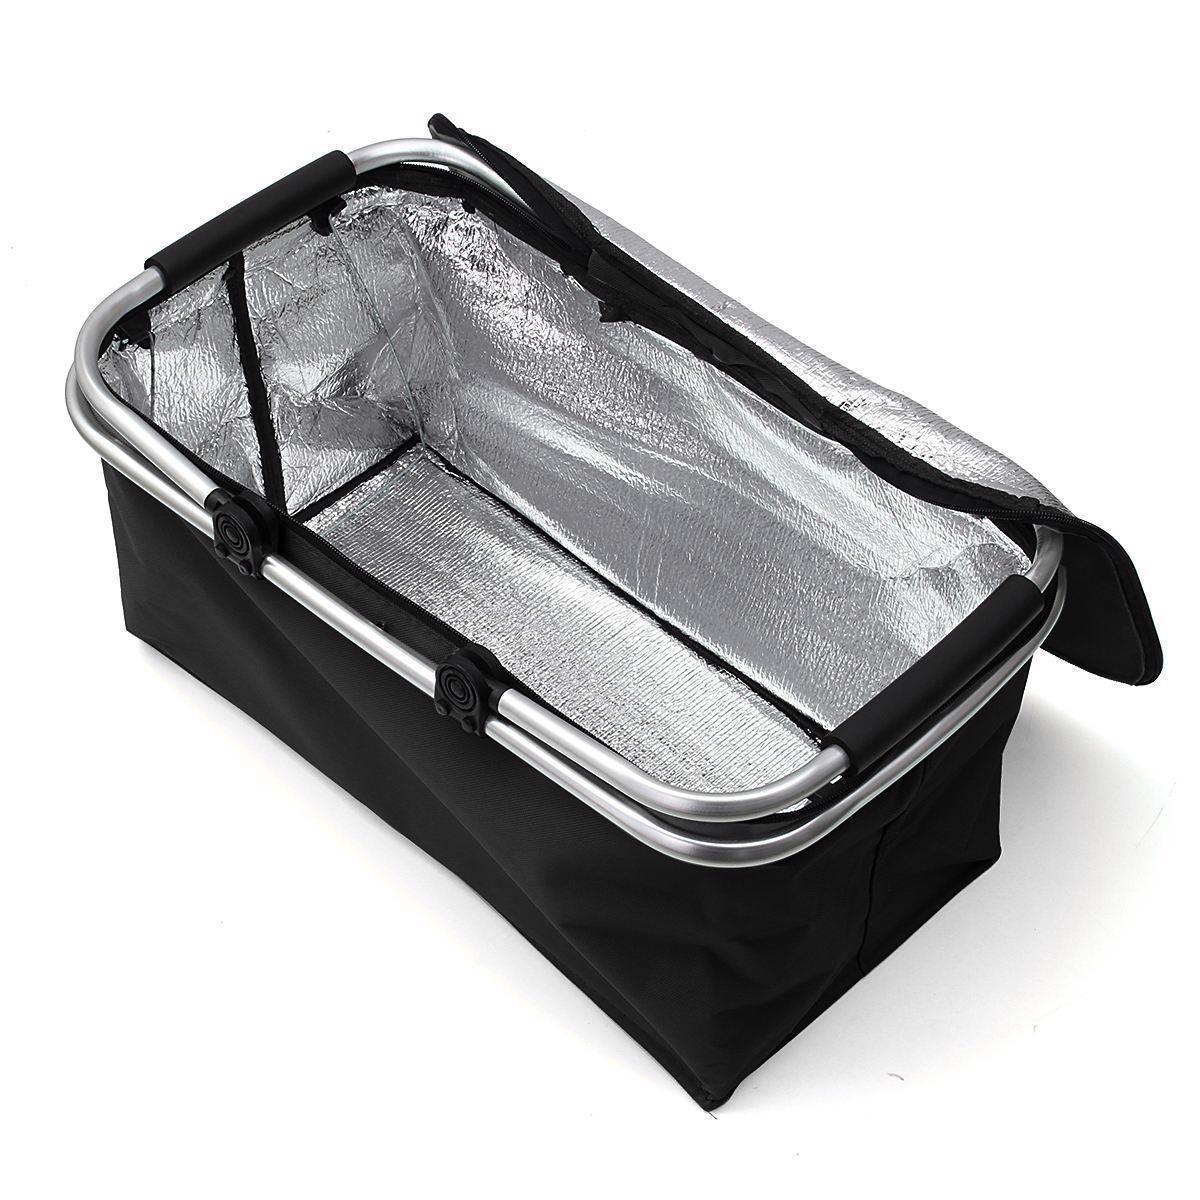 Folding Picnic Camping Outdoor Aluminum Beach Hiking Bag Storage Basket Box